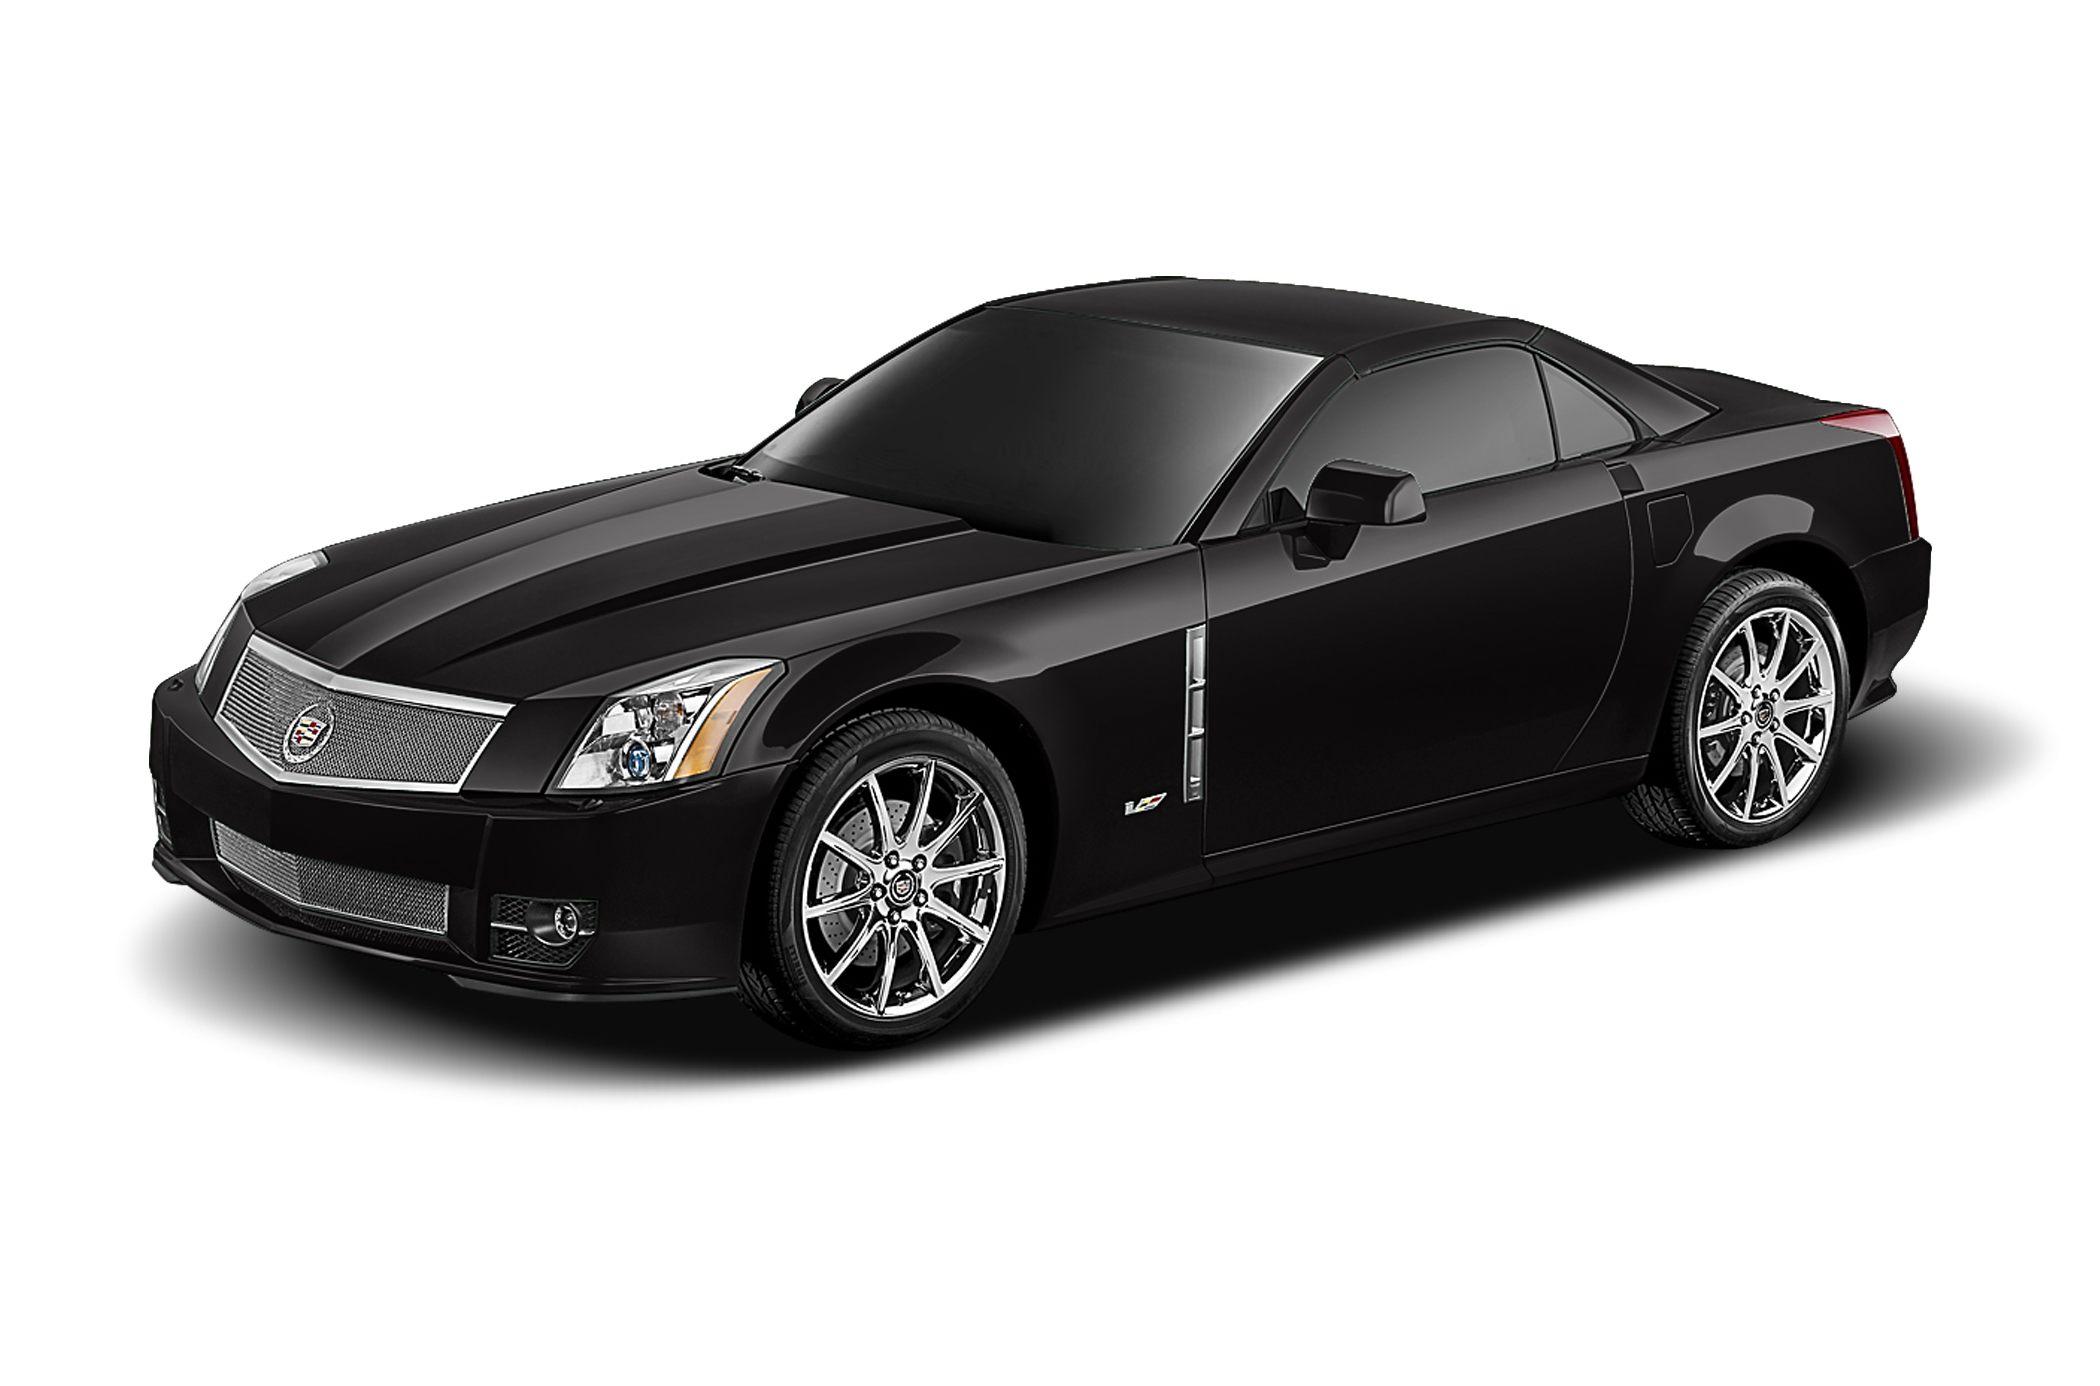 2009CadillacXLR-V